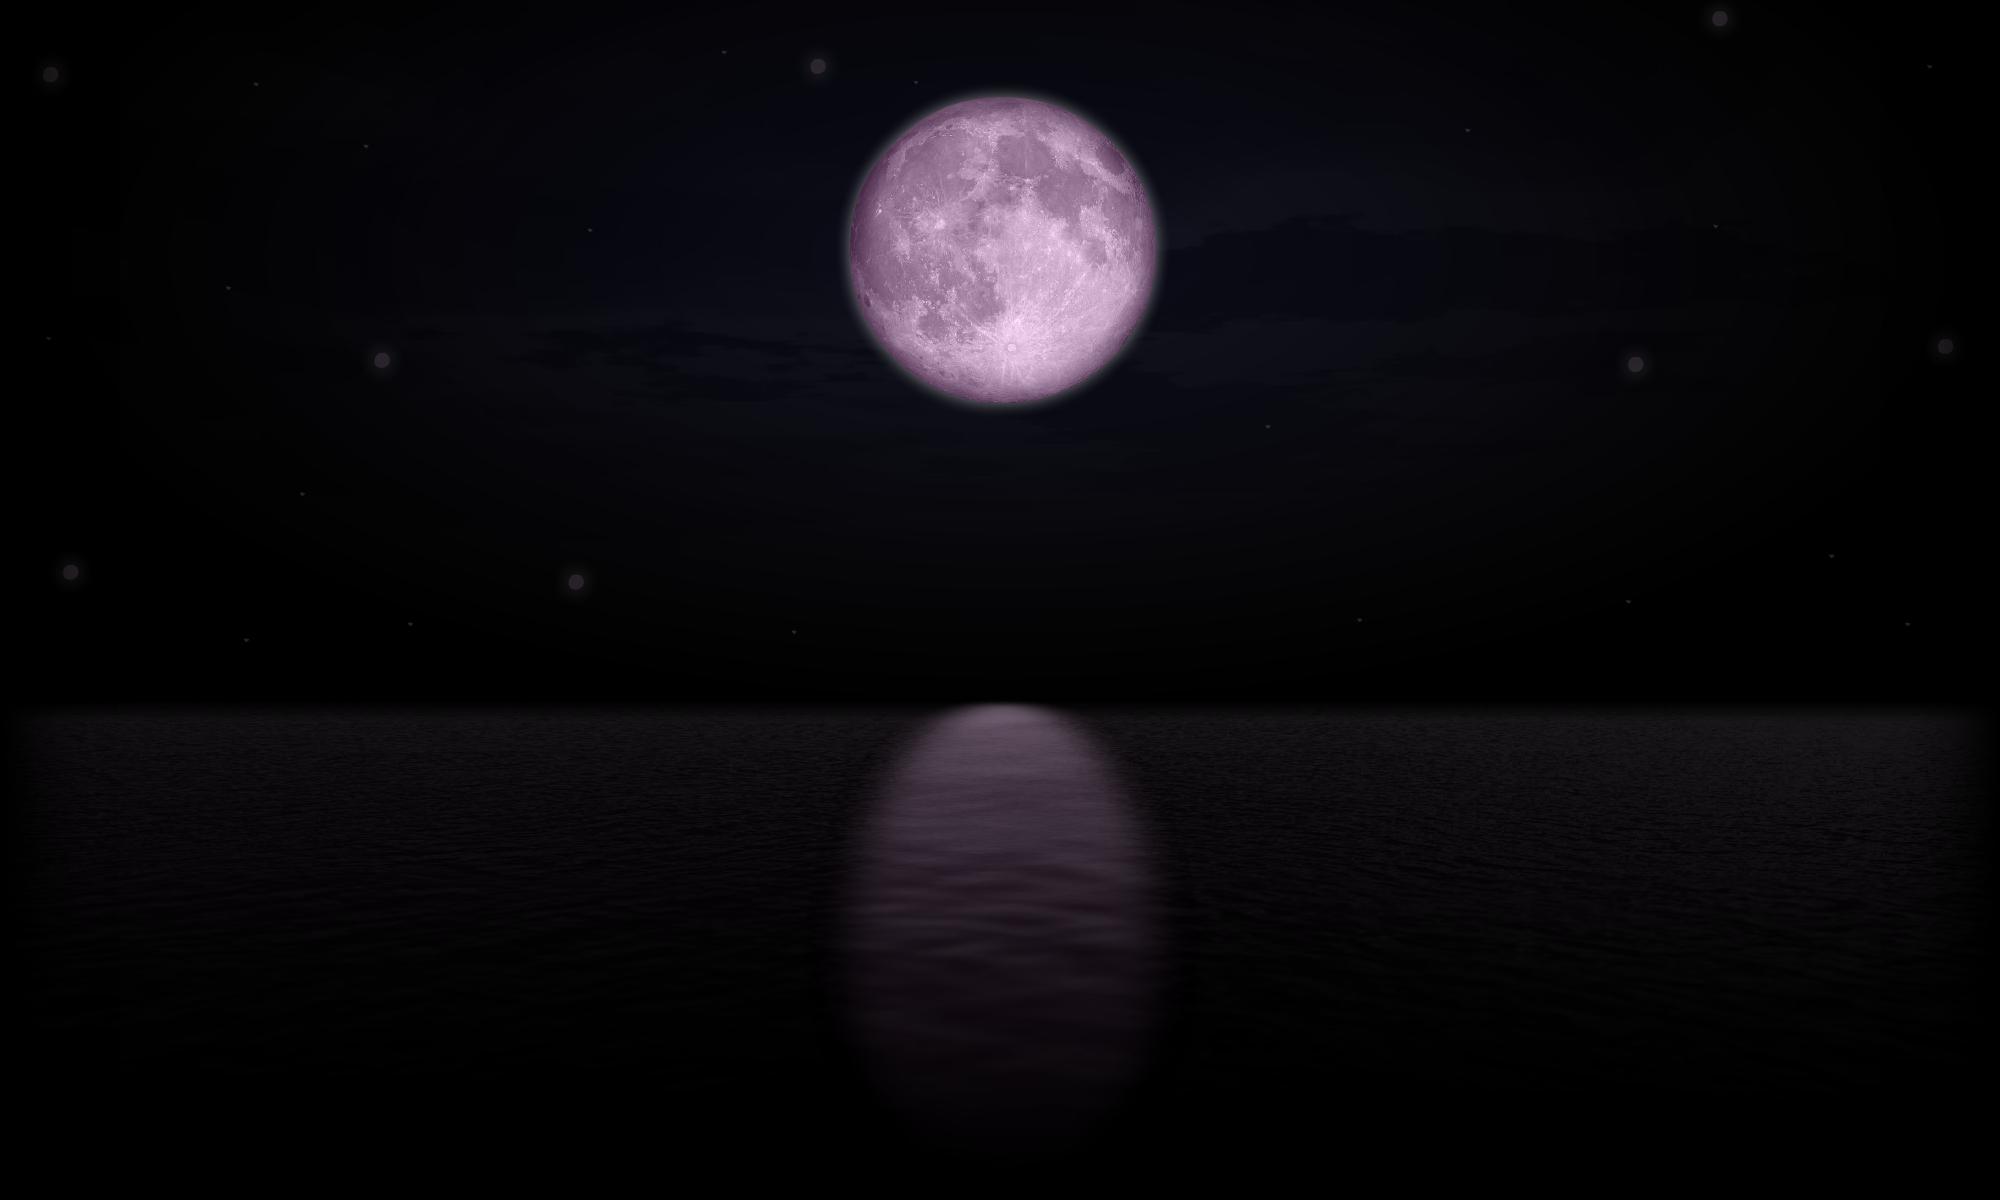 Ocean + Moon + Photo Editing